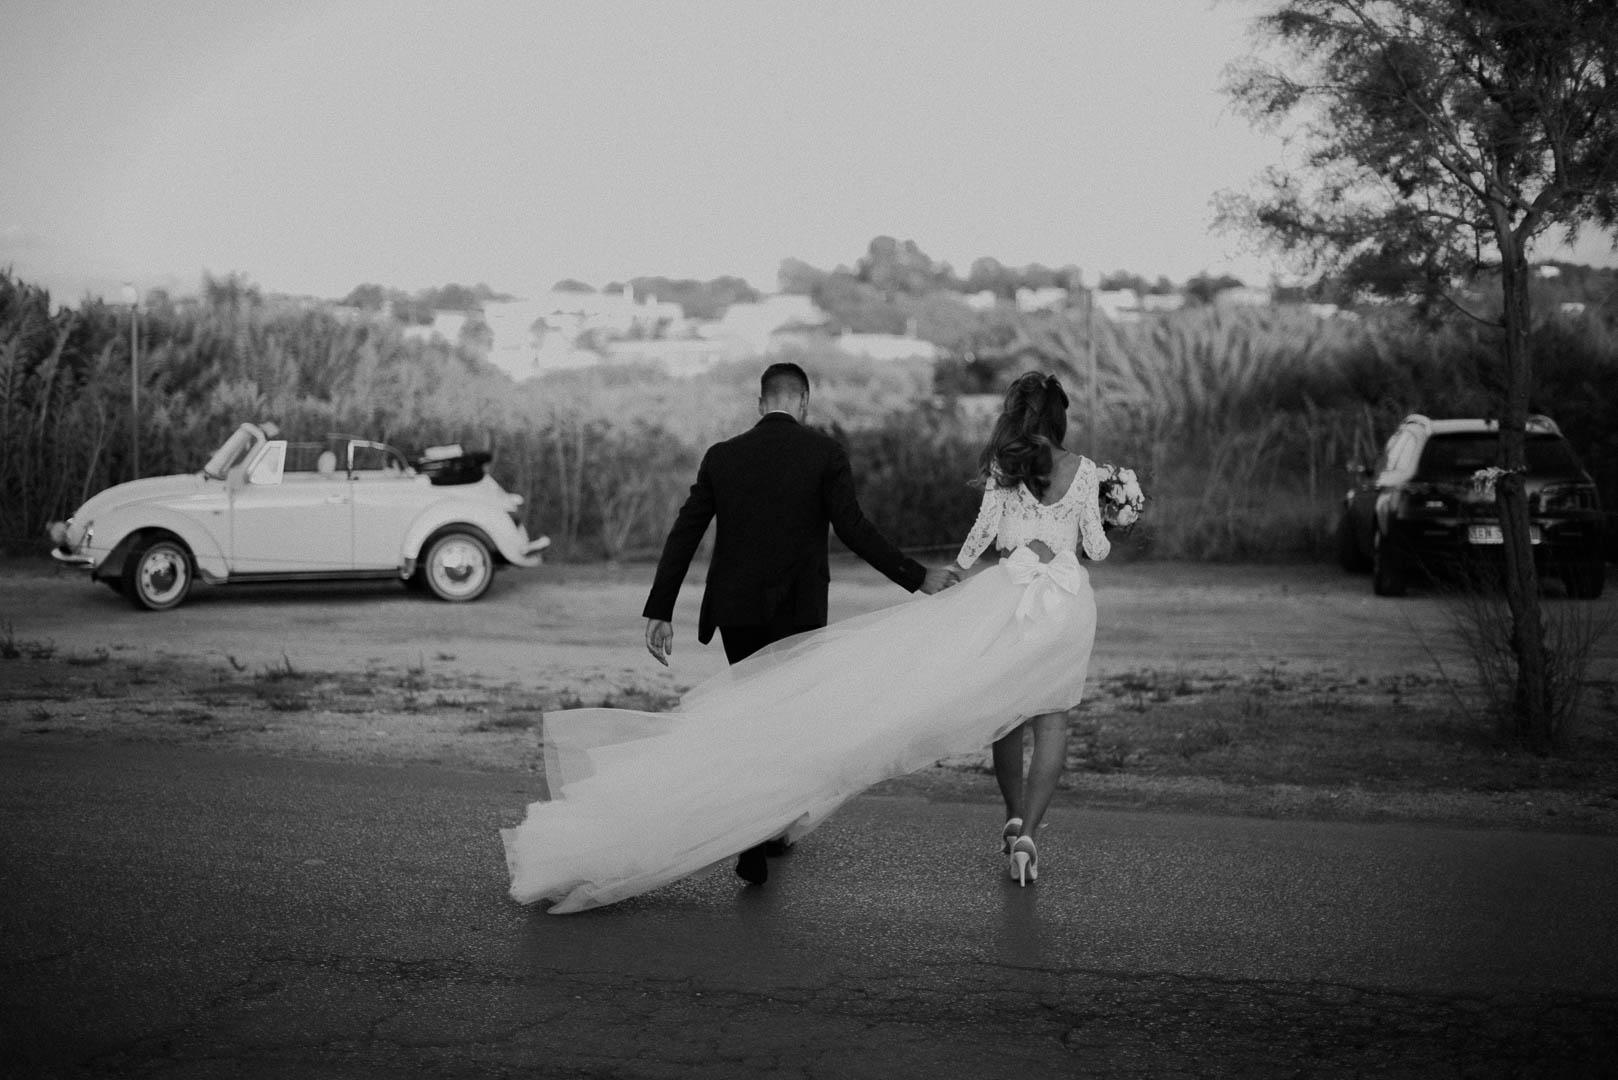 wedding-photographer-destination-fineart-bespoke-reportage-napoli-nabilah-vivianeizzo-spazio46-99